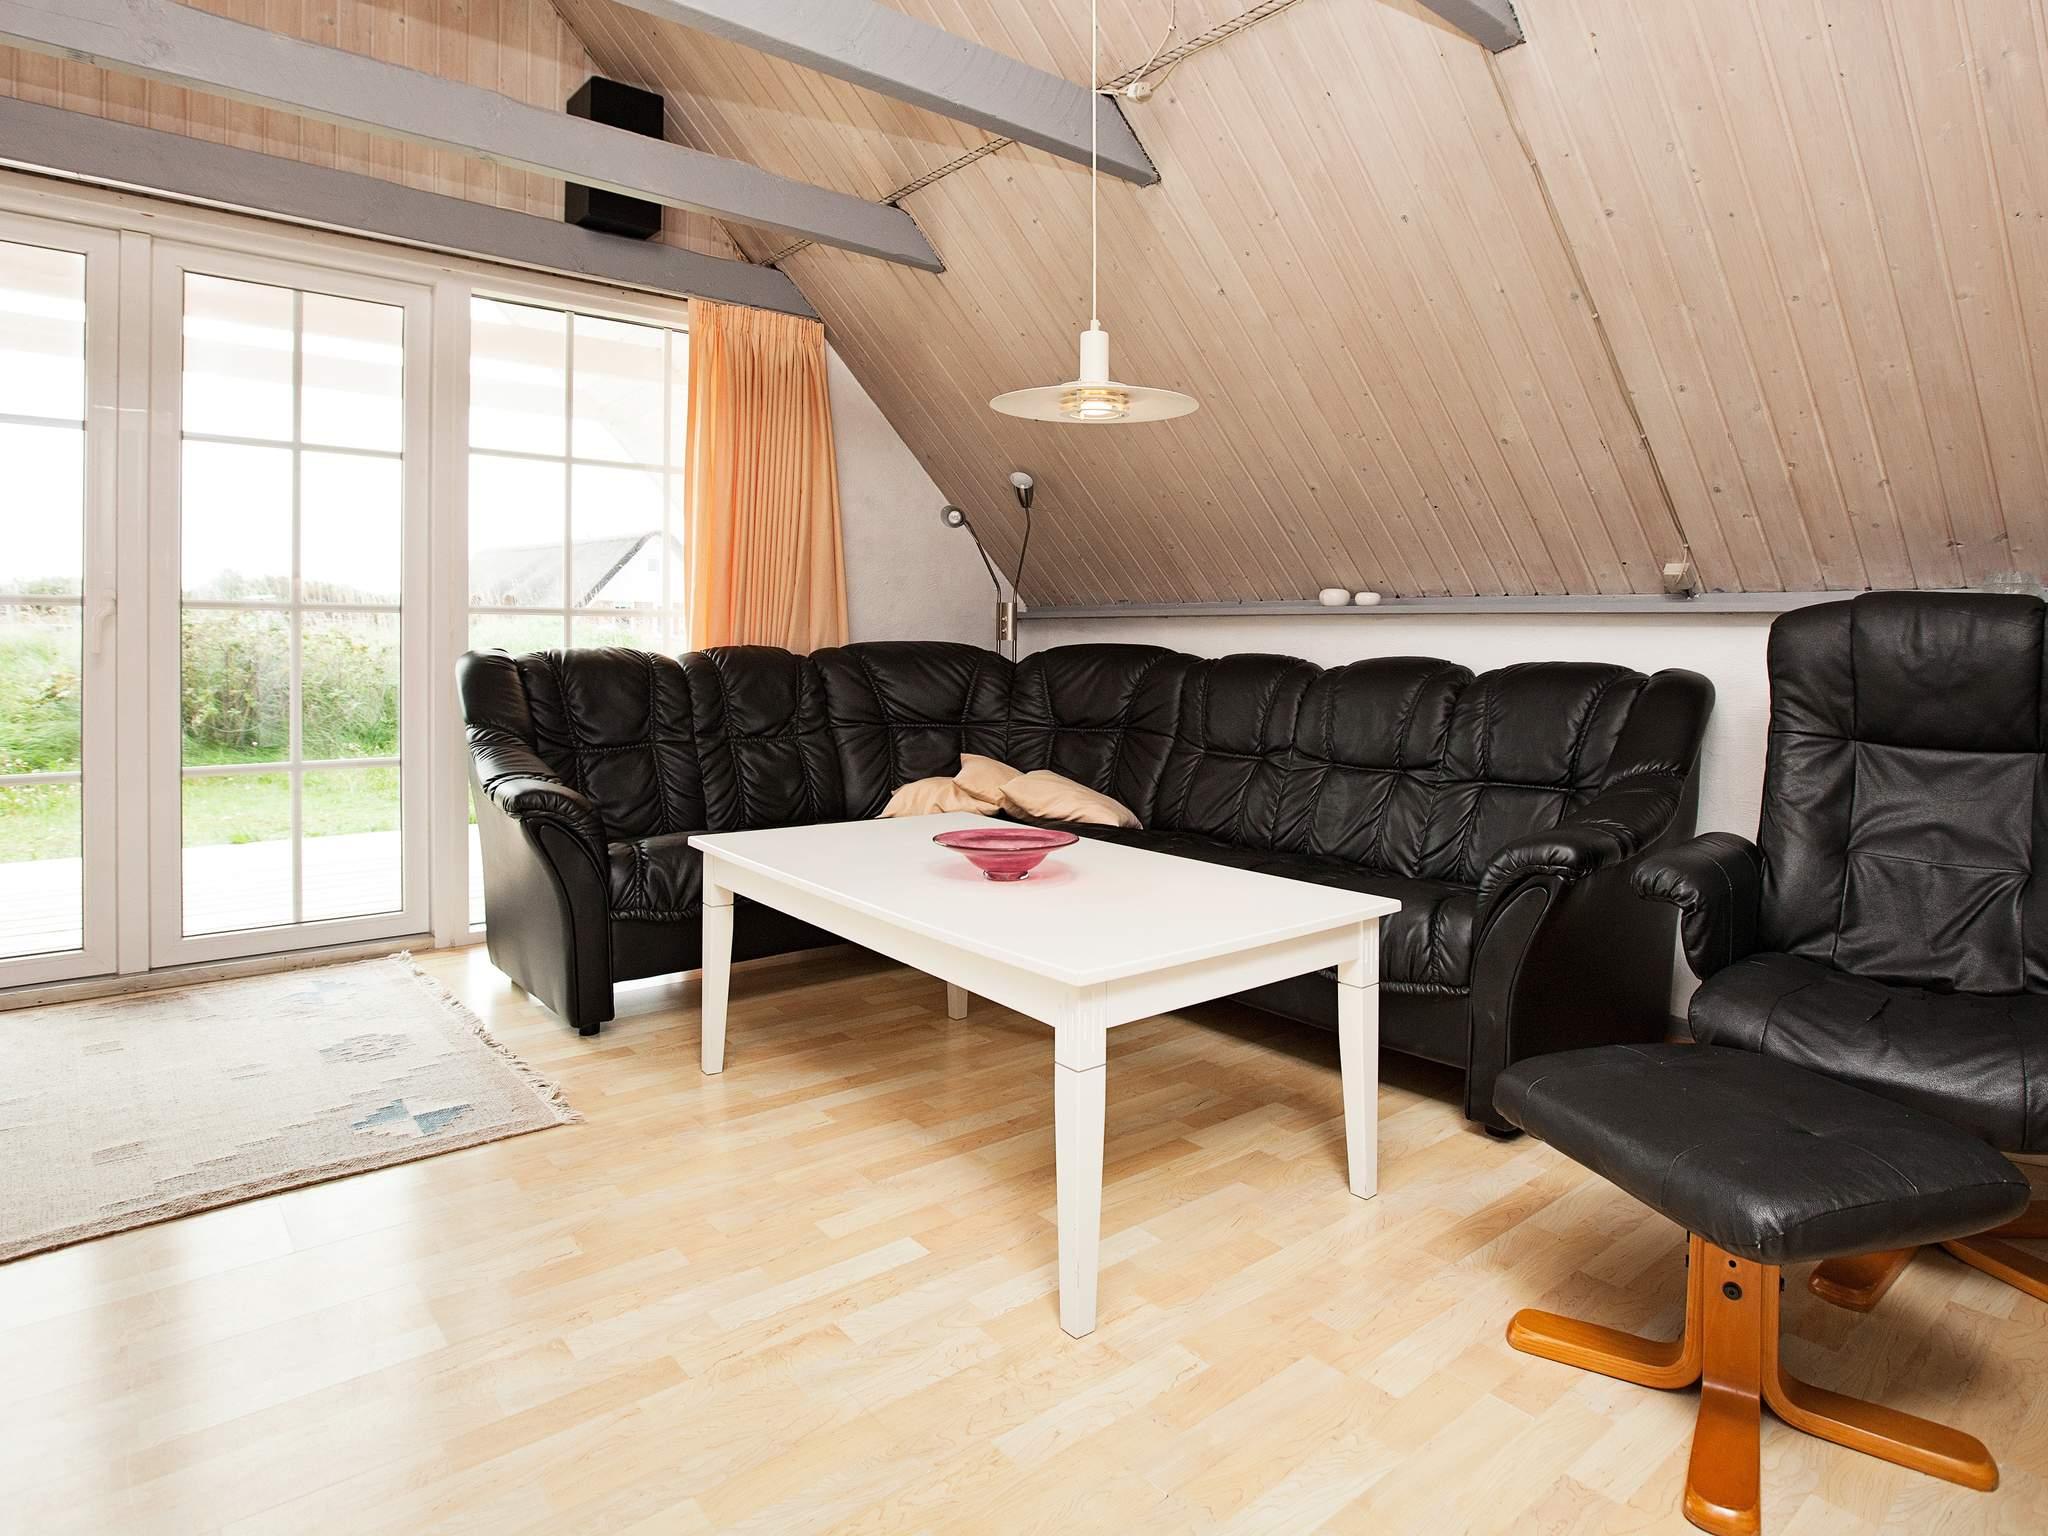 Ferienhaus Klegod (371178), Klegod, , Westjütland, Dänemark, Bild 3